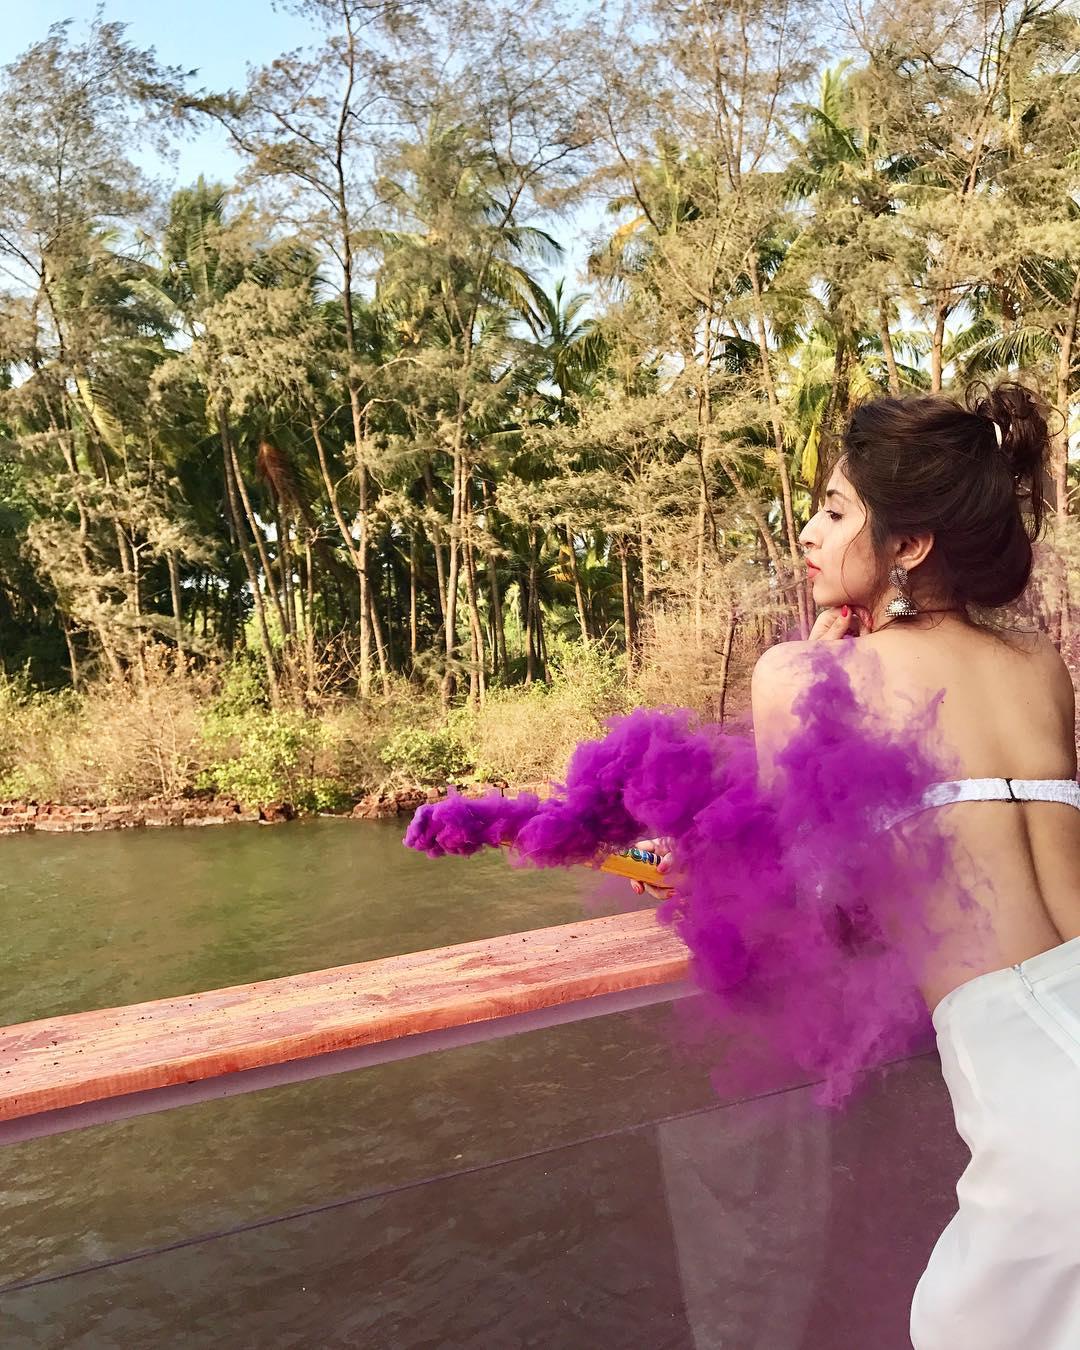 actress sonarika bhadoria hot latest photoshoot 9